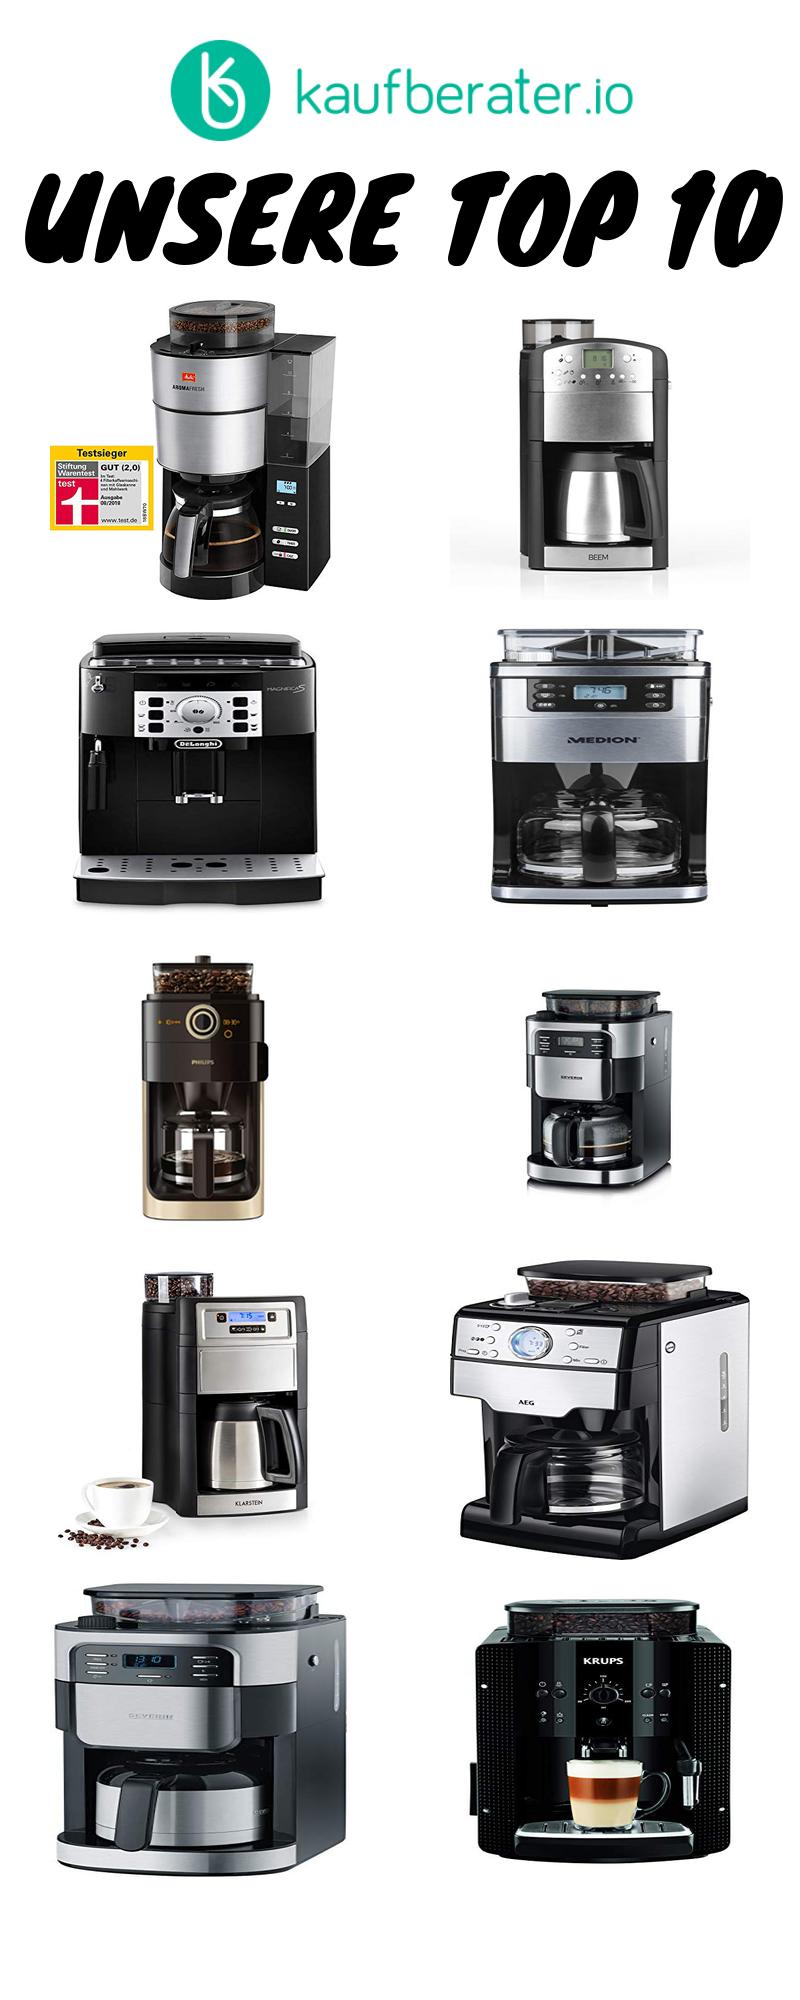 Kaffeemaschine Mit Mahlwerk Infos Ratgeber Test Kaffeemaschine Kaffeesorten Kaffee